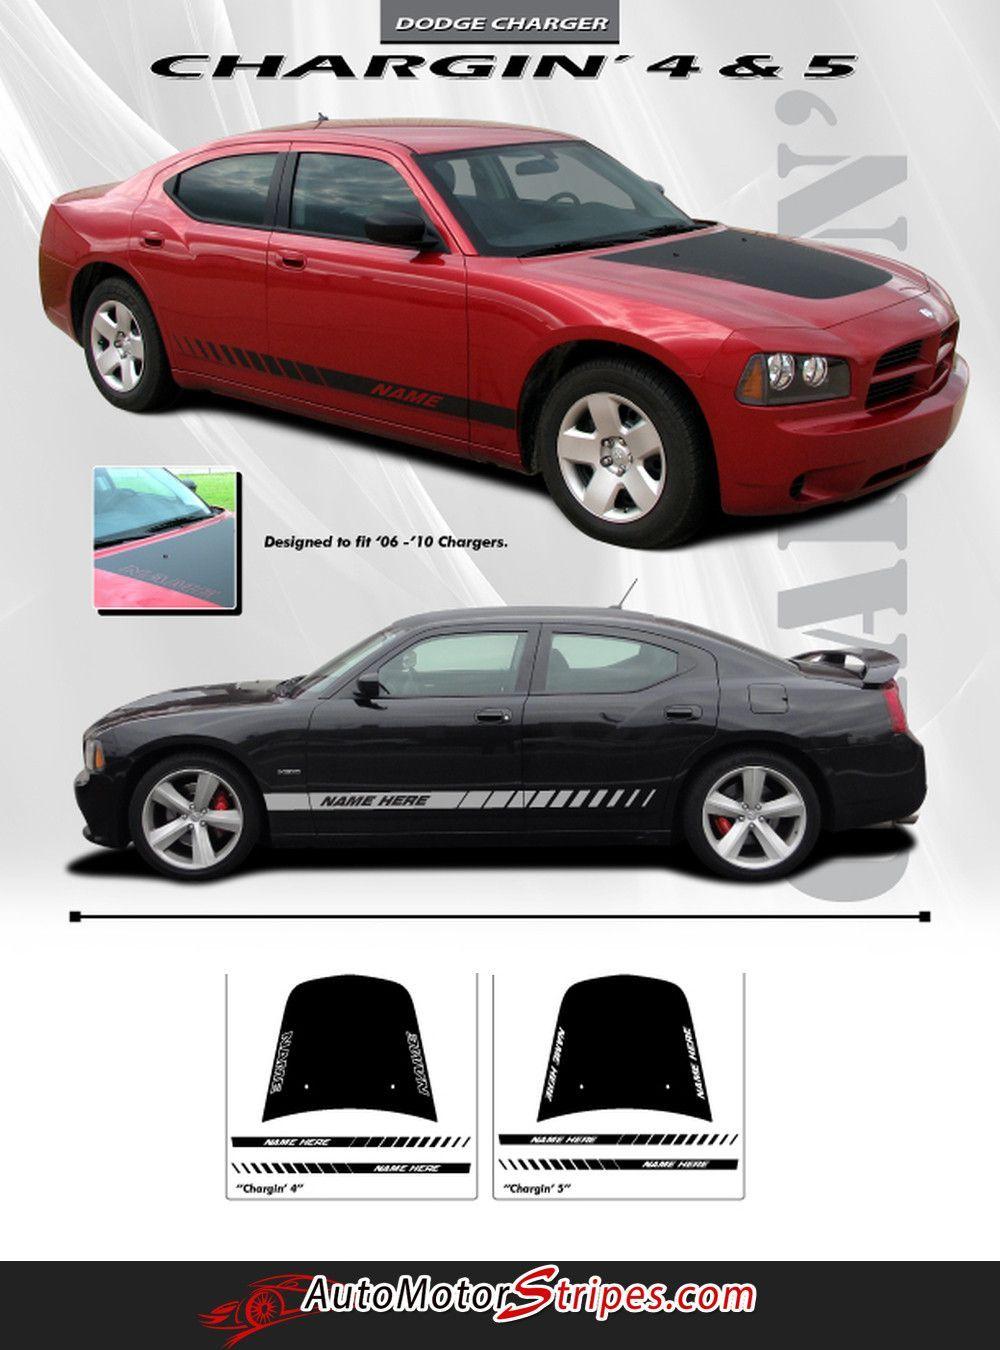 2006 2010 Dodge Charger Chargin 4 Hood Lower Rocker Strobe Hemi Daytona Style Vinyl Stripes 3m Decals Kit Dodge Charger Dodge Hemi